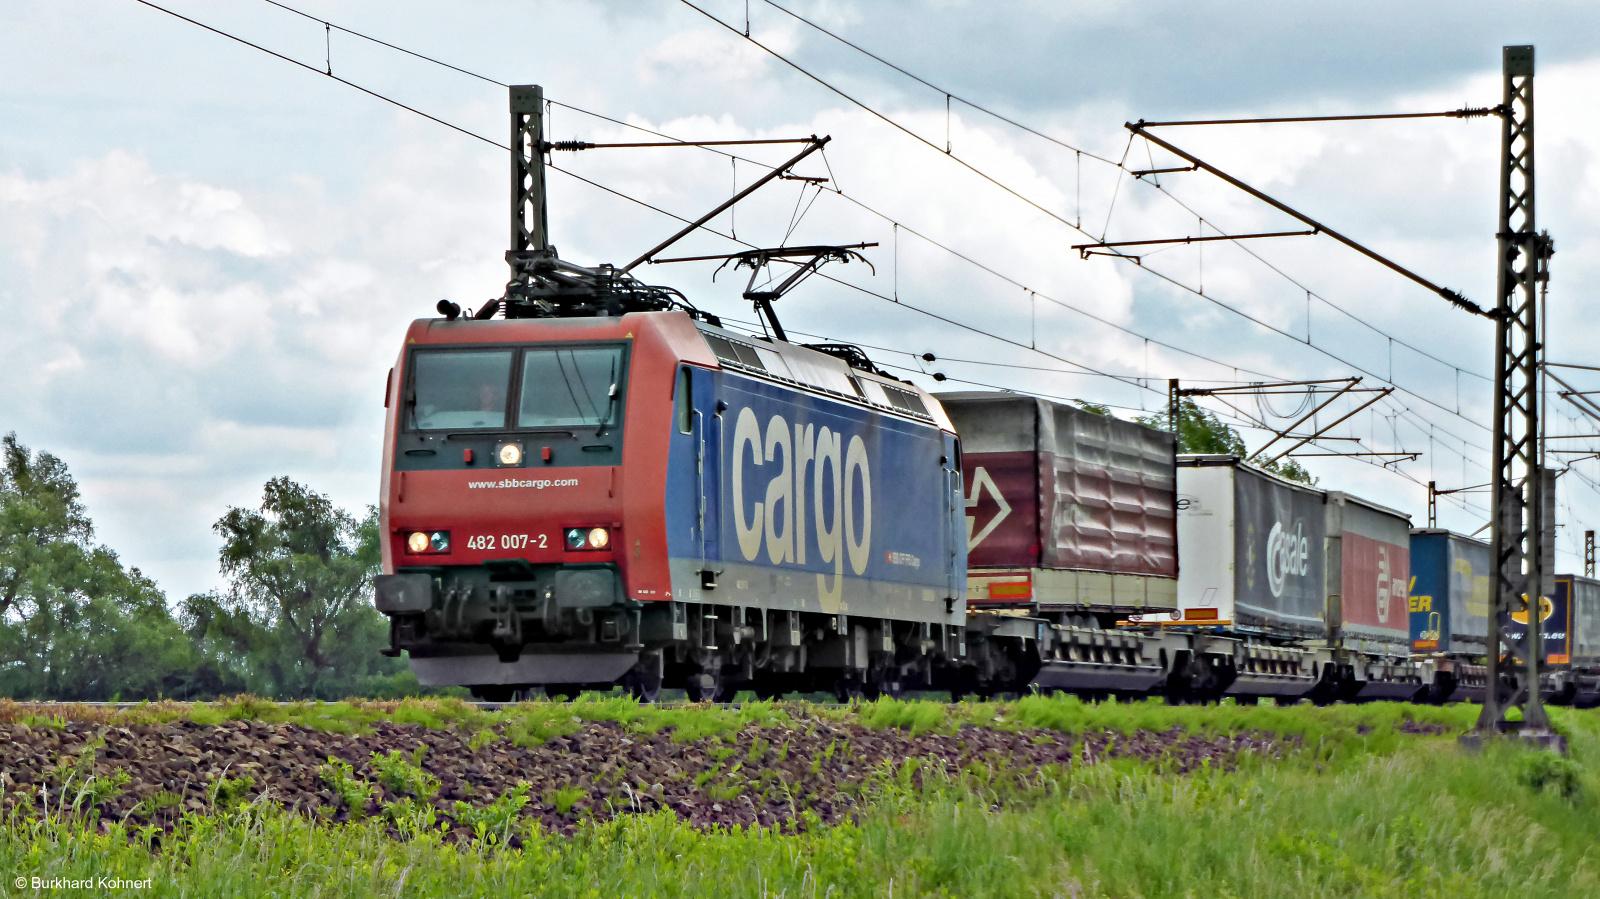 482 007-2 SBB-Cargo